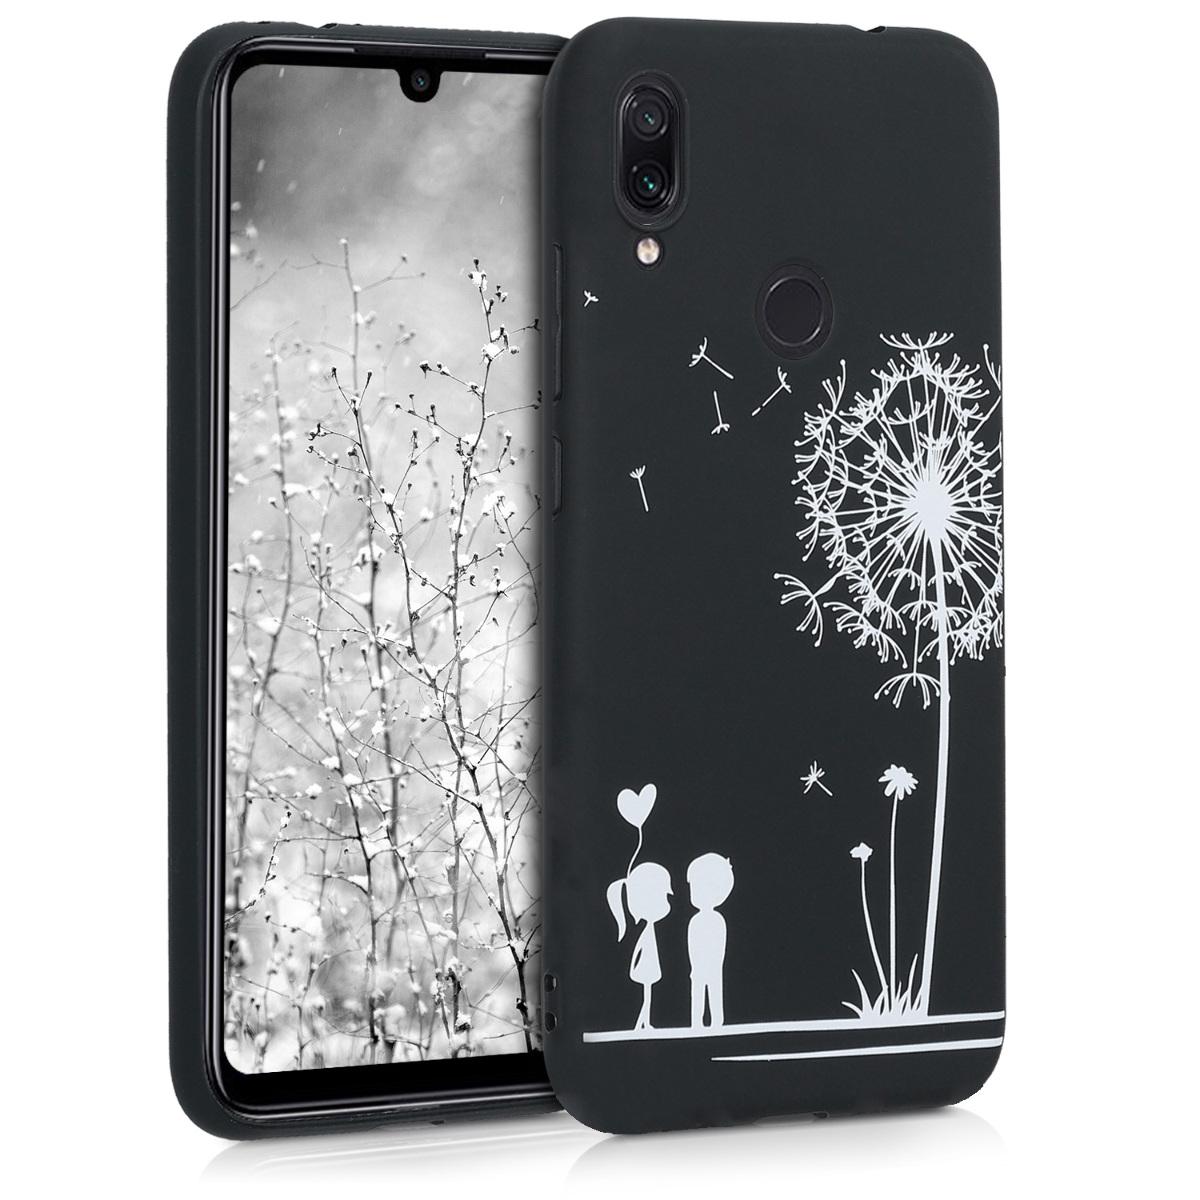 KW Θήκη Σιλικόνης Xiaomi Redmi Note 7 / Note 7 Pro - White / Black (48449.04)